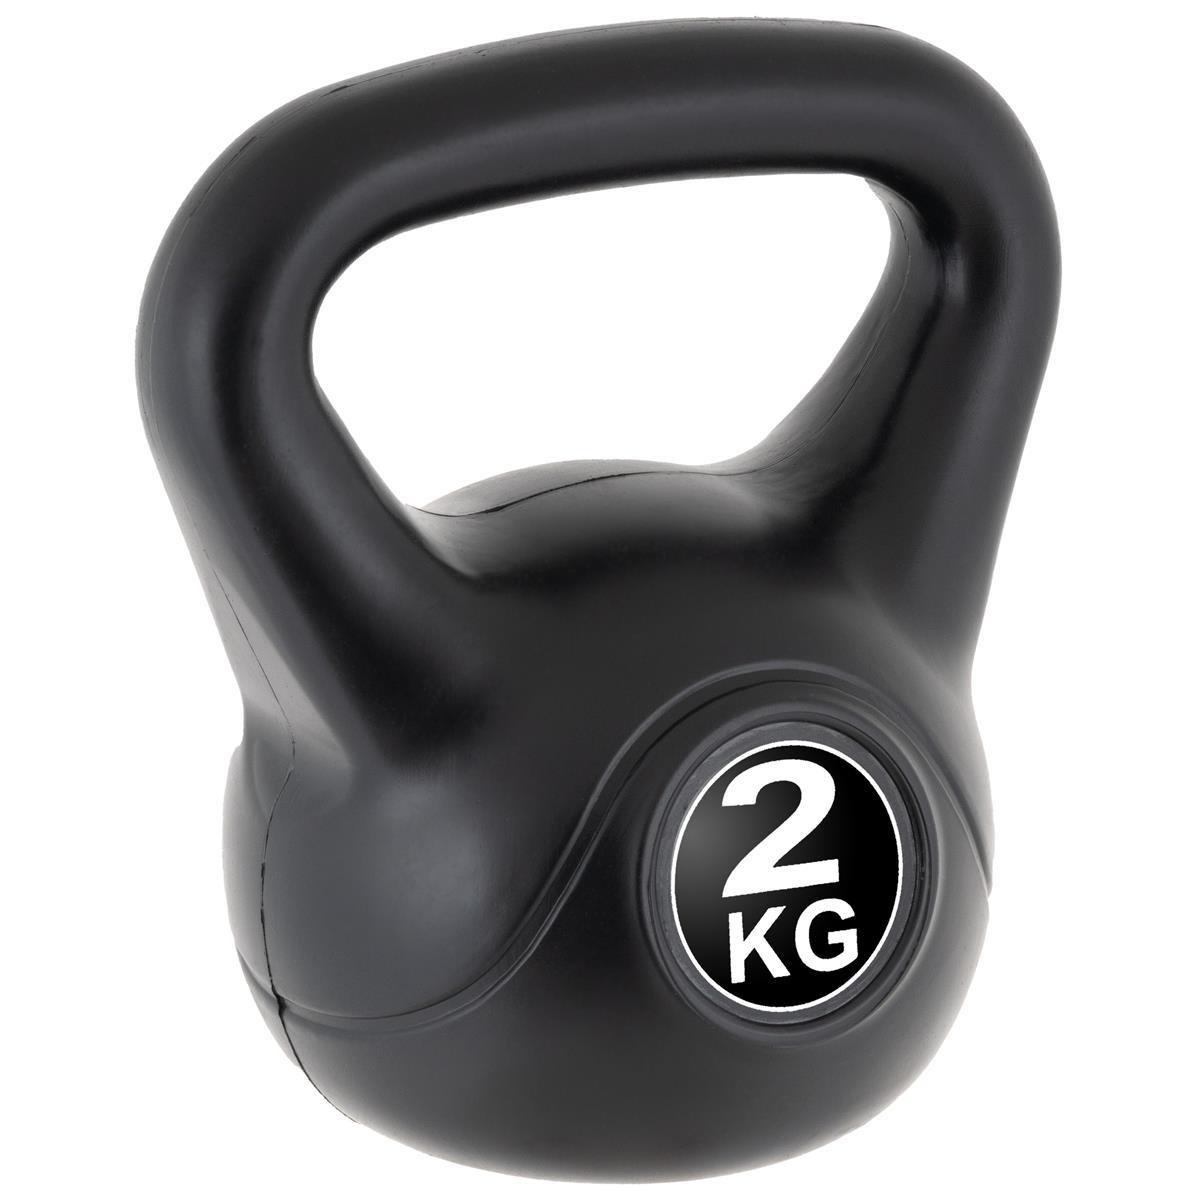 MAXXIVA Kettlebell Kugelhantel 2kg schwarz Krafttraining Fitness Rundhantel